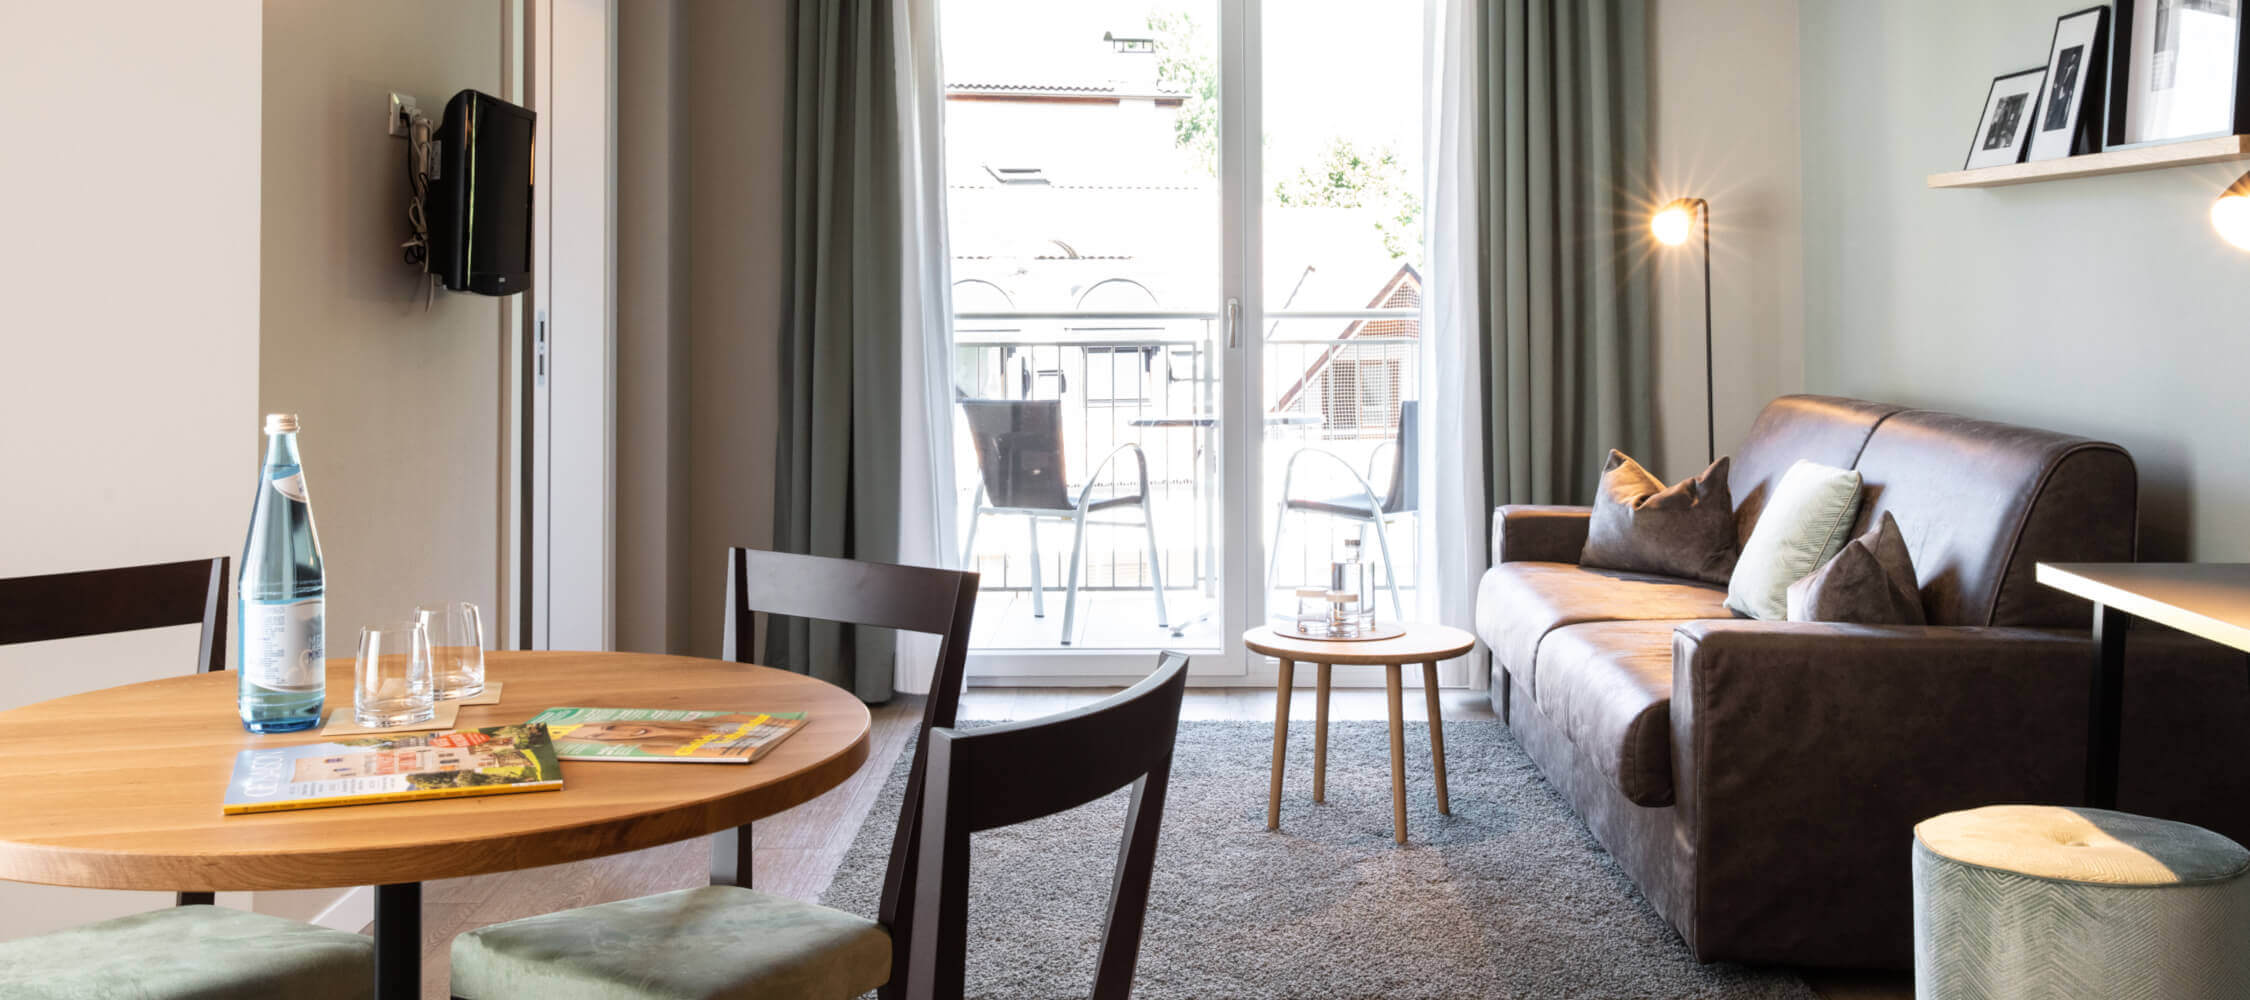 City_Hotel_Merano_Suite_City_3_Raum_Wohnzimmer_BeatricePilotto_3T1A1871_2250x1000